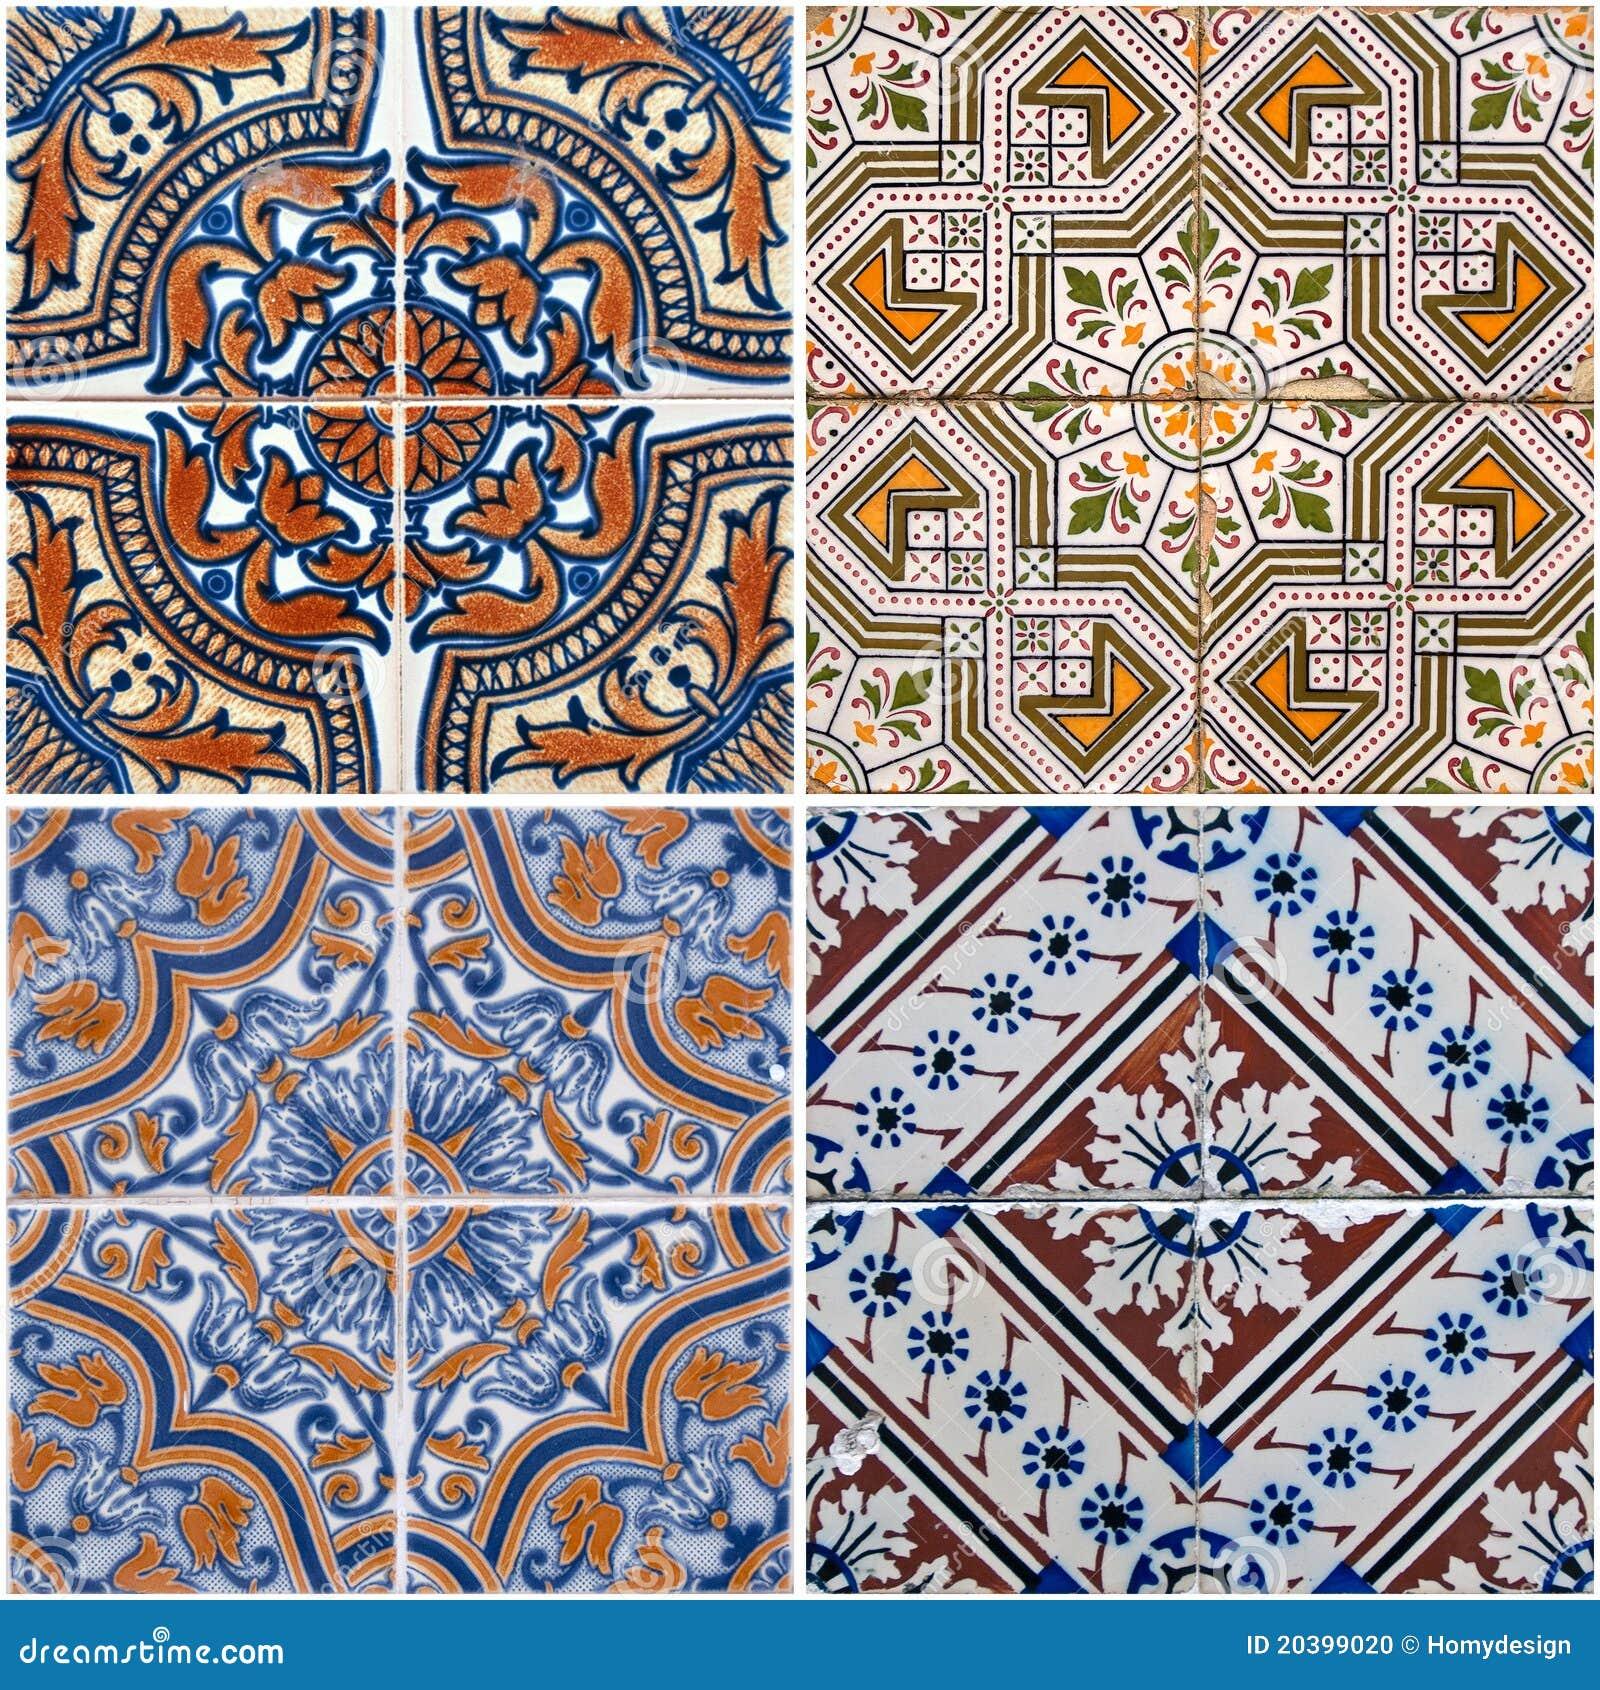 Vintage Ceramic Tiles Stock Photo - Image: 20399020